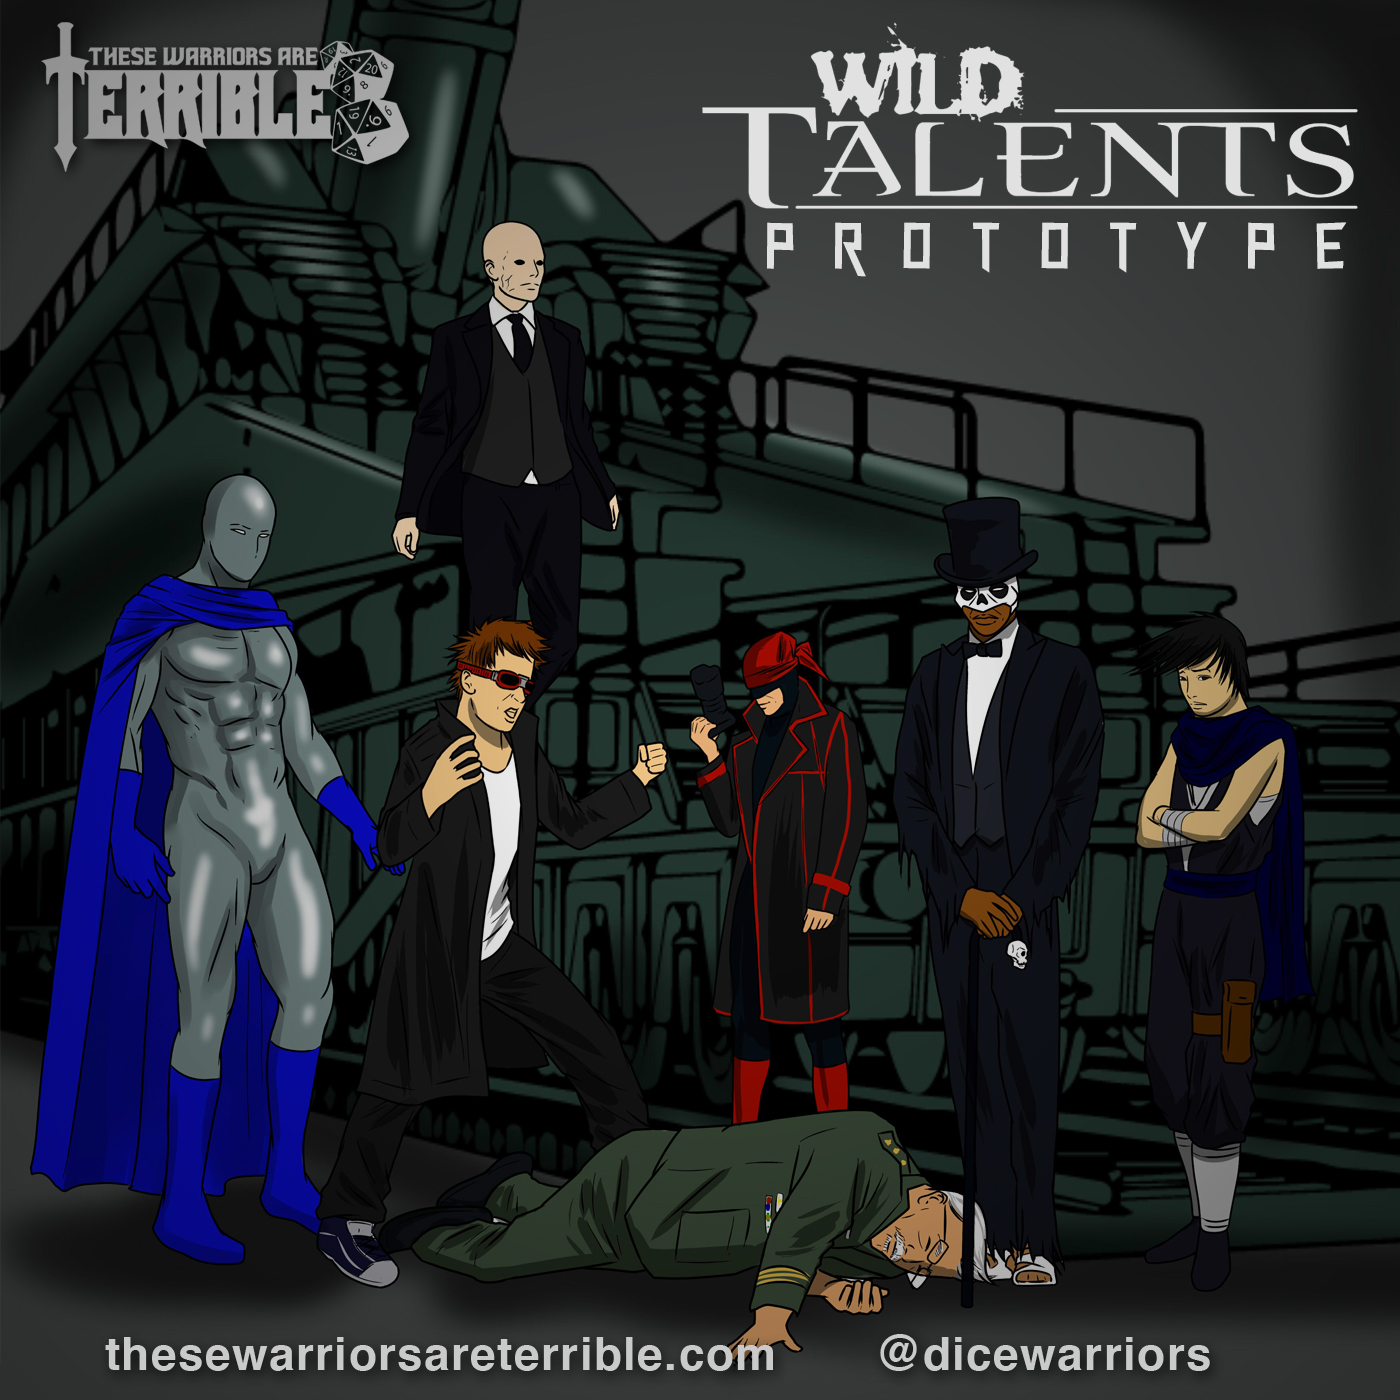 WildTalents-Prototype-AlbumArt300x300